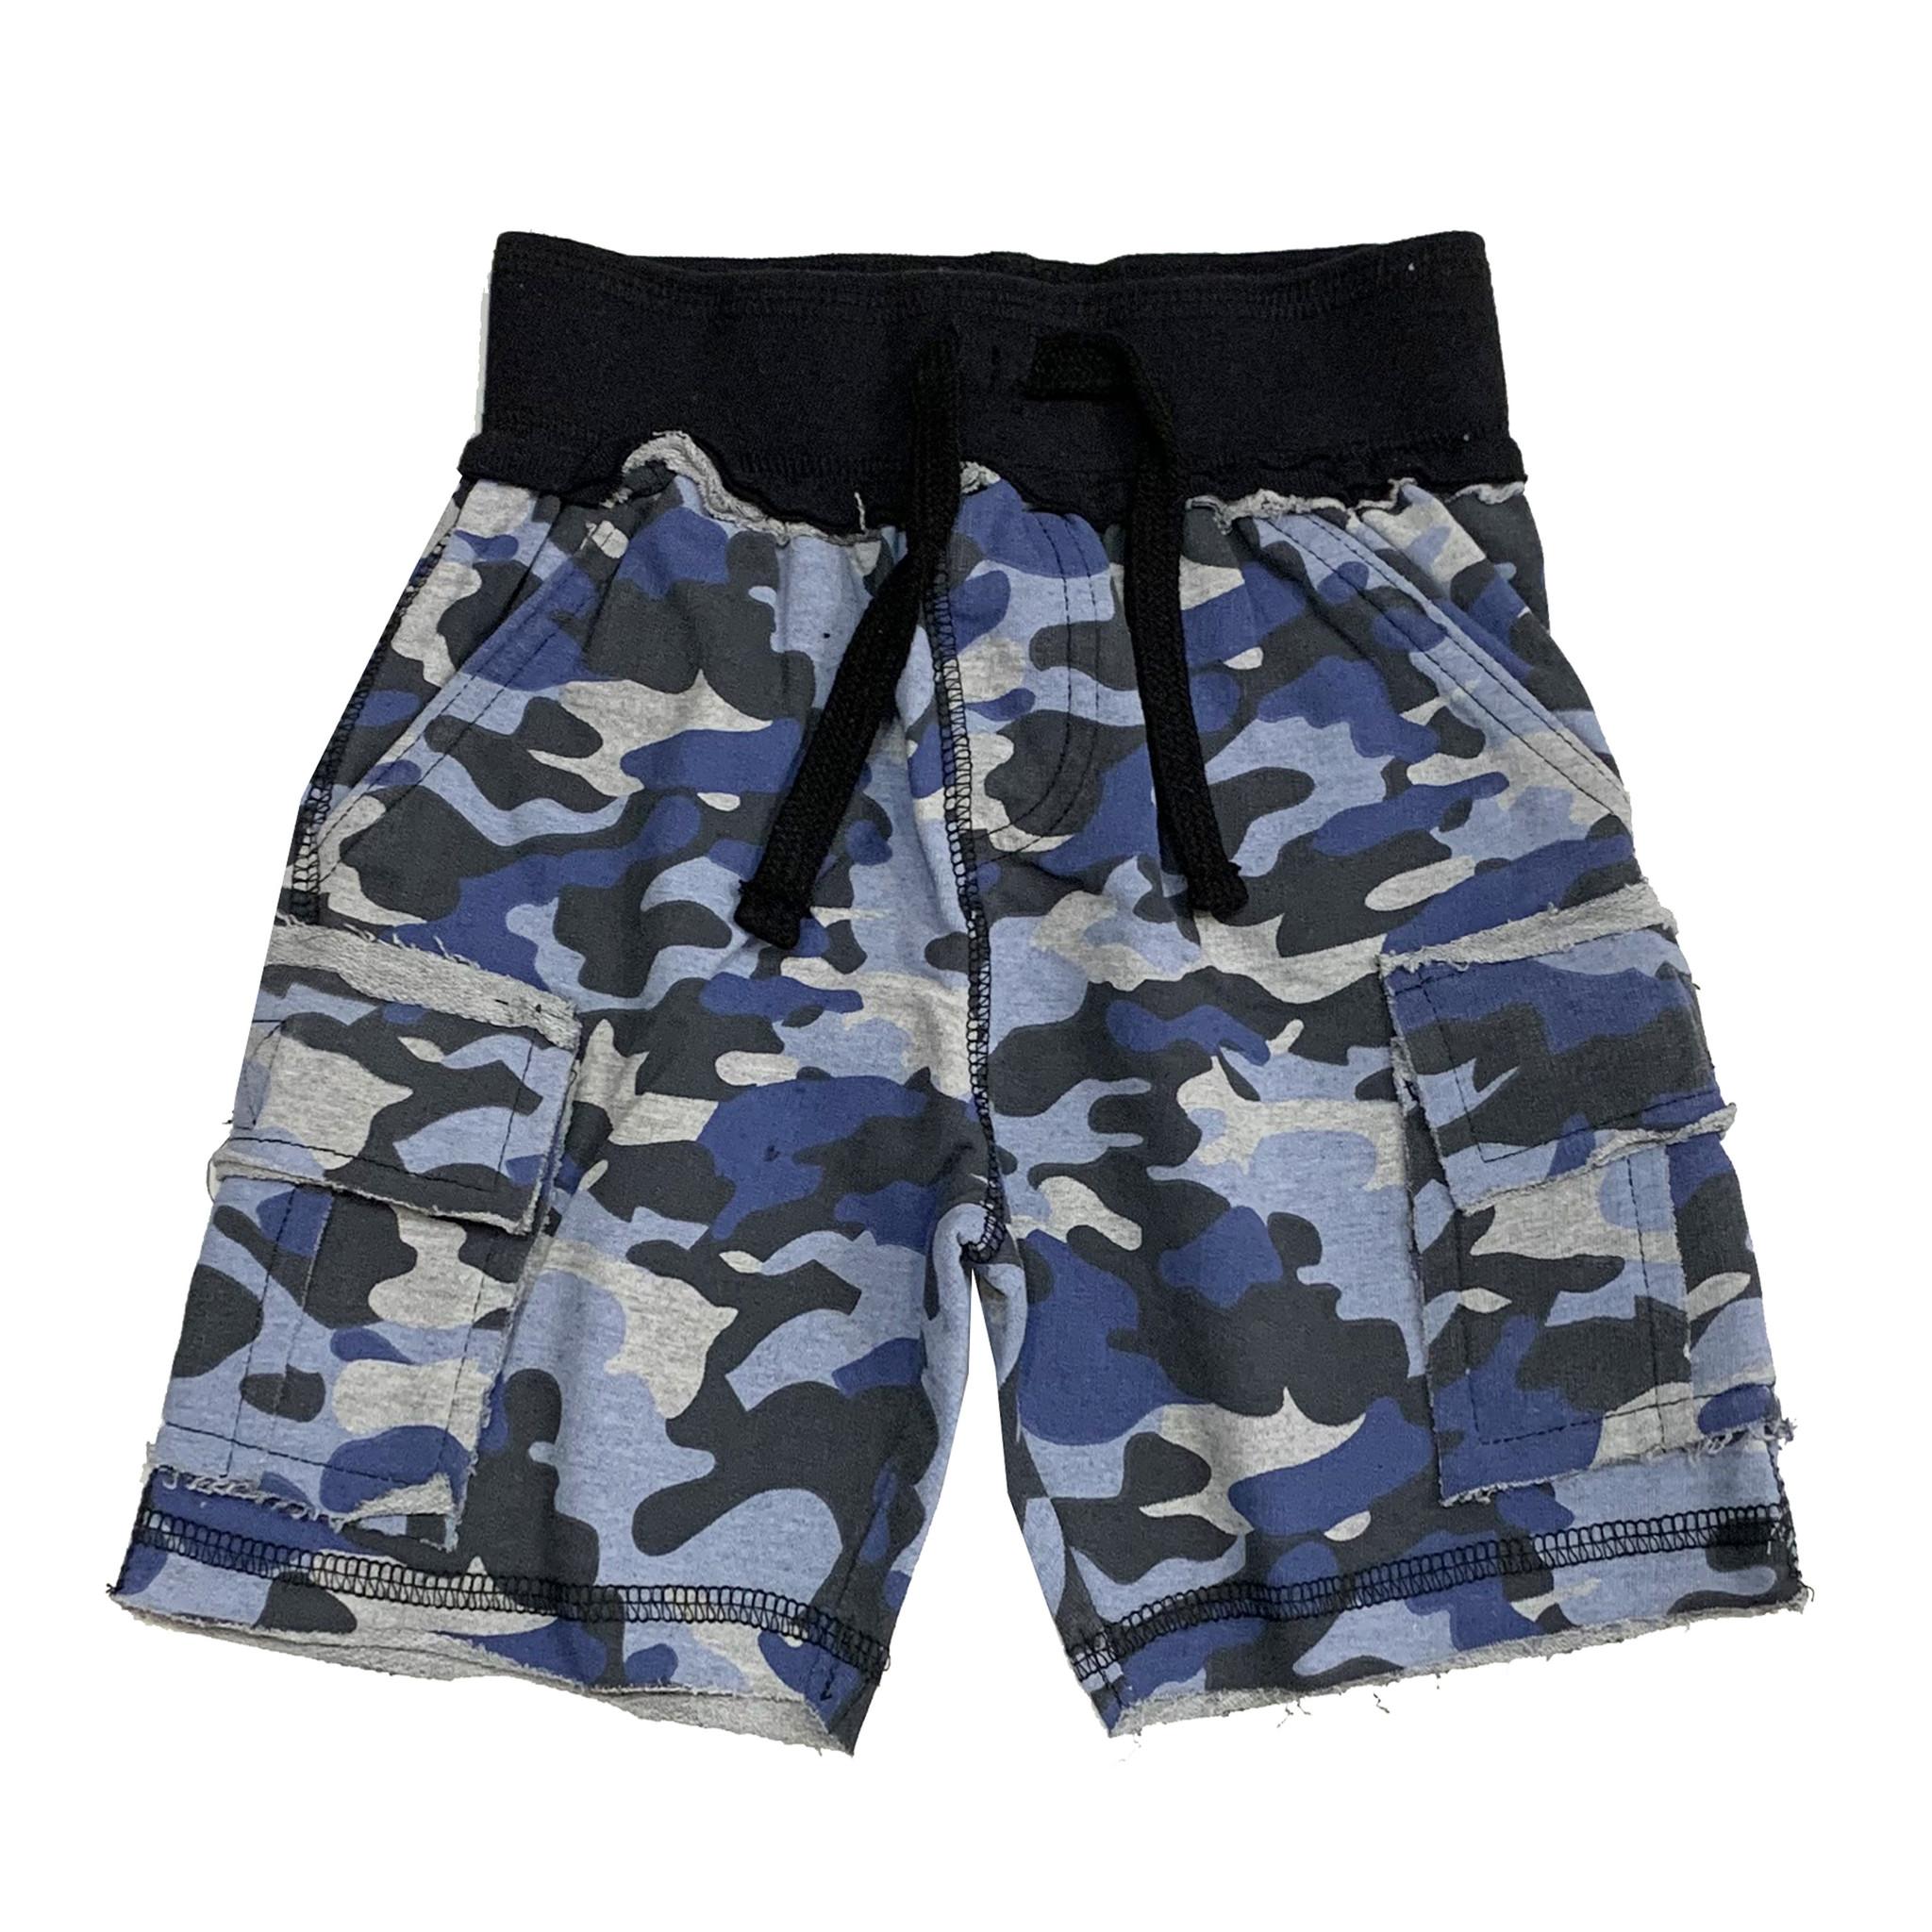 Mish Navy Camo Short